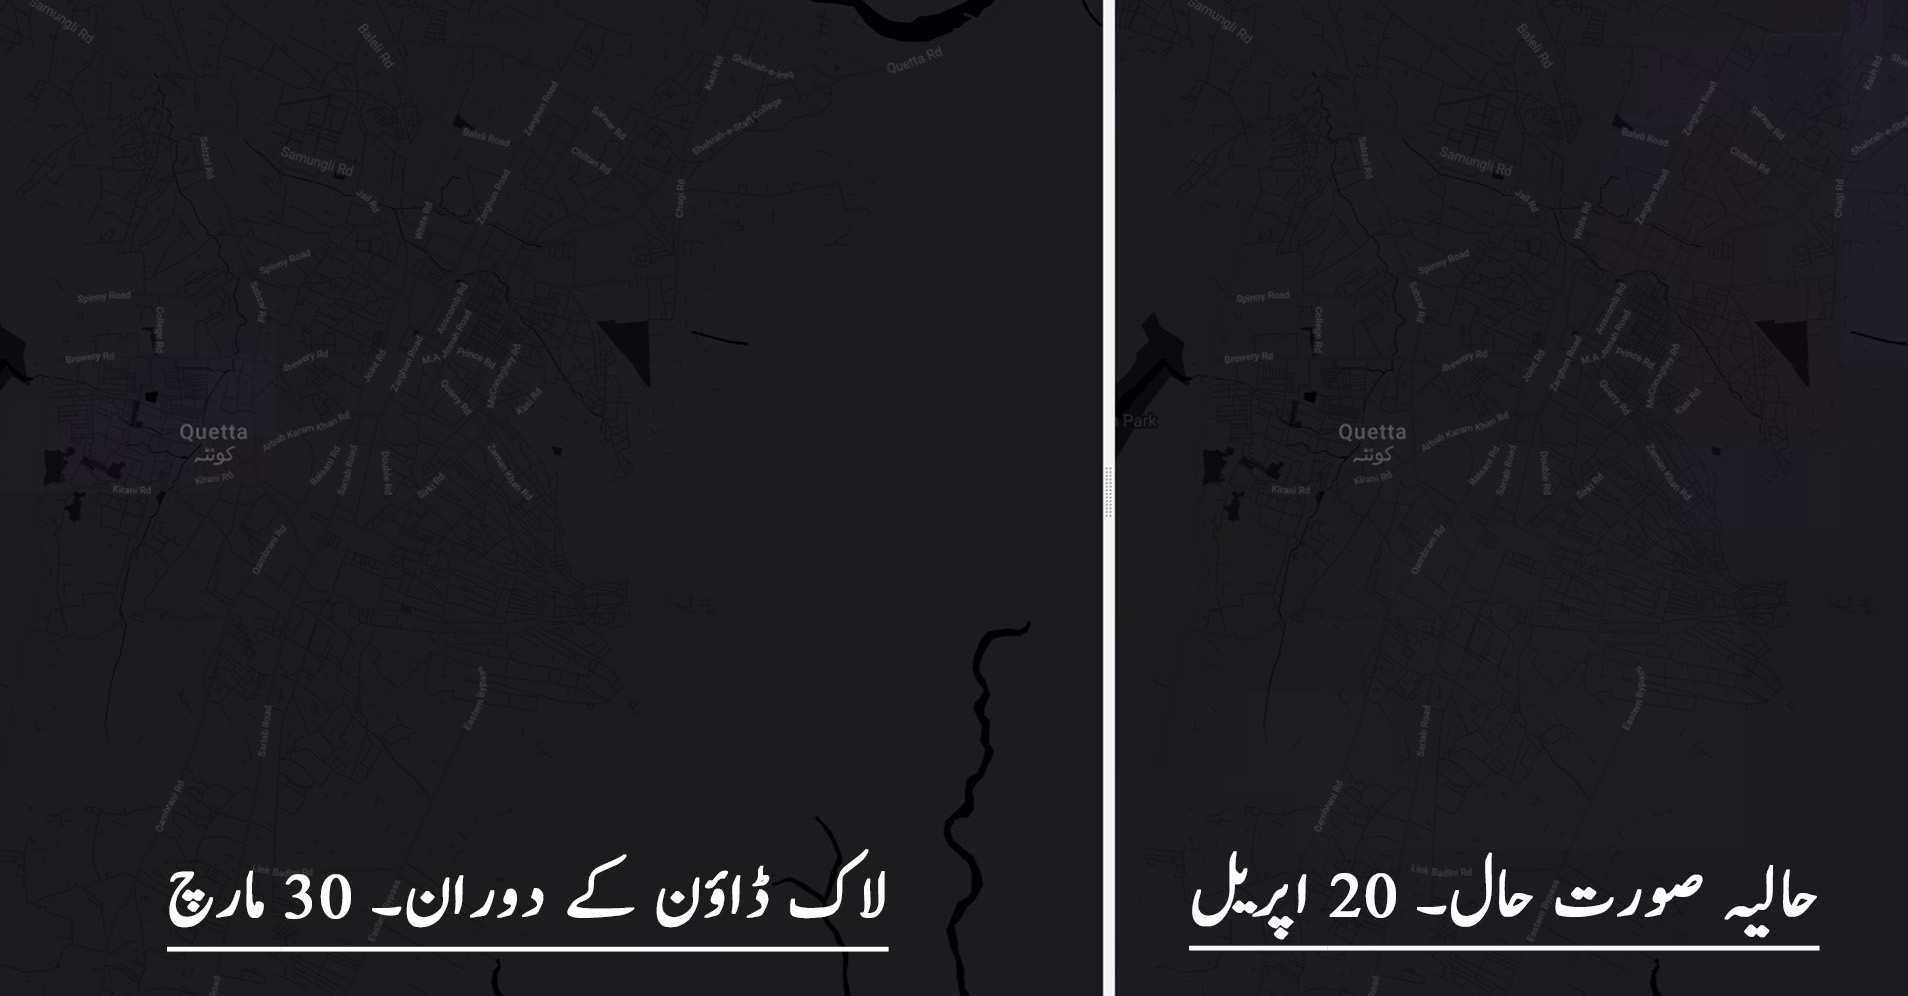 Quetta.jpg